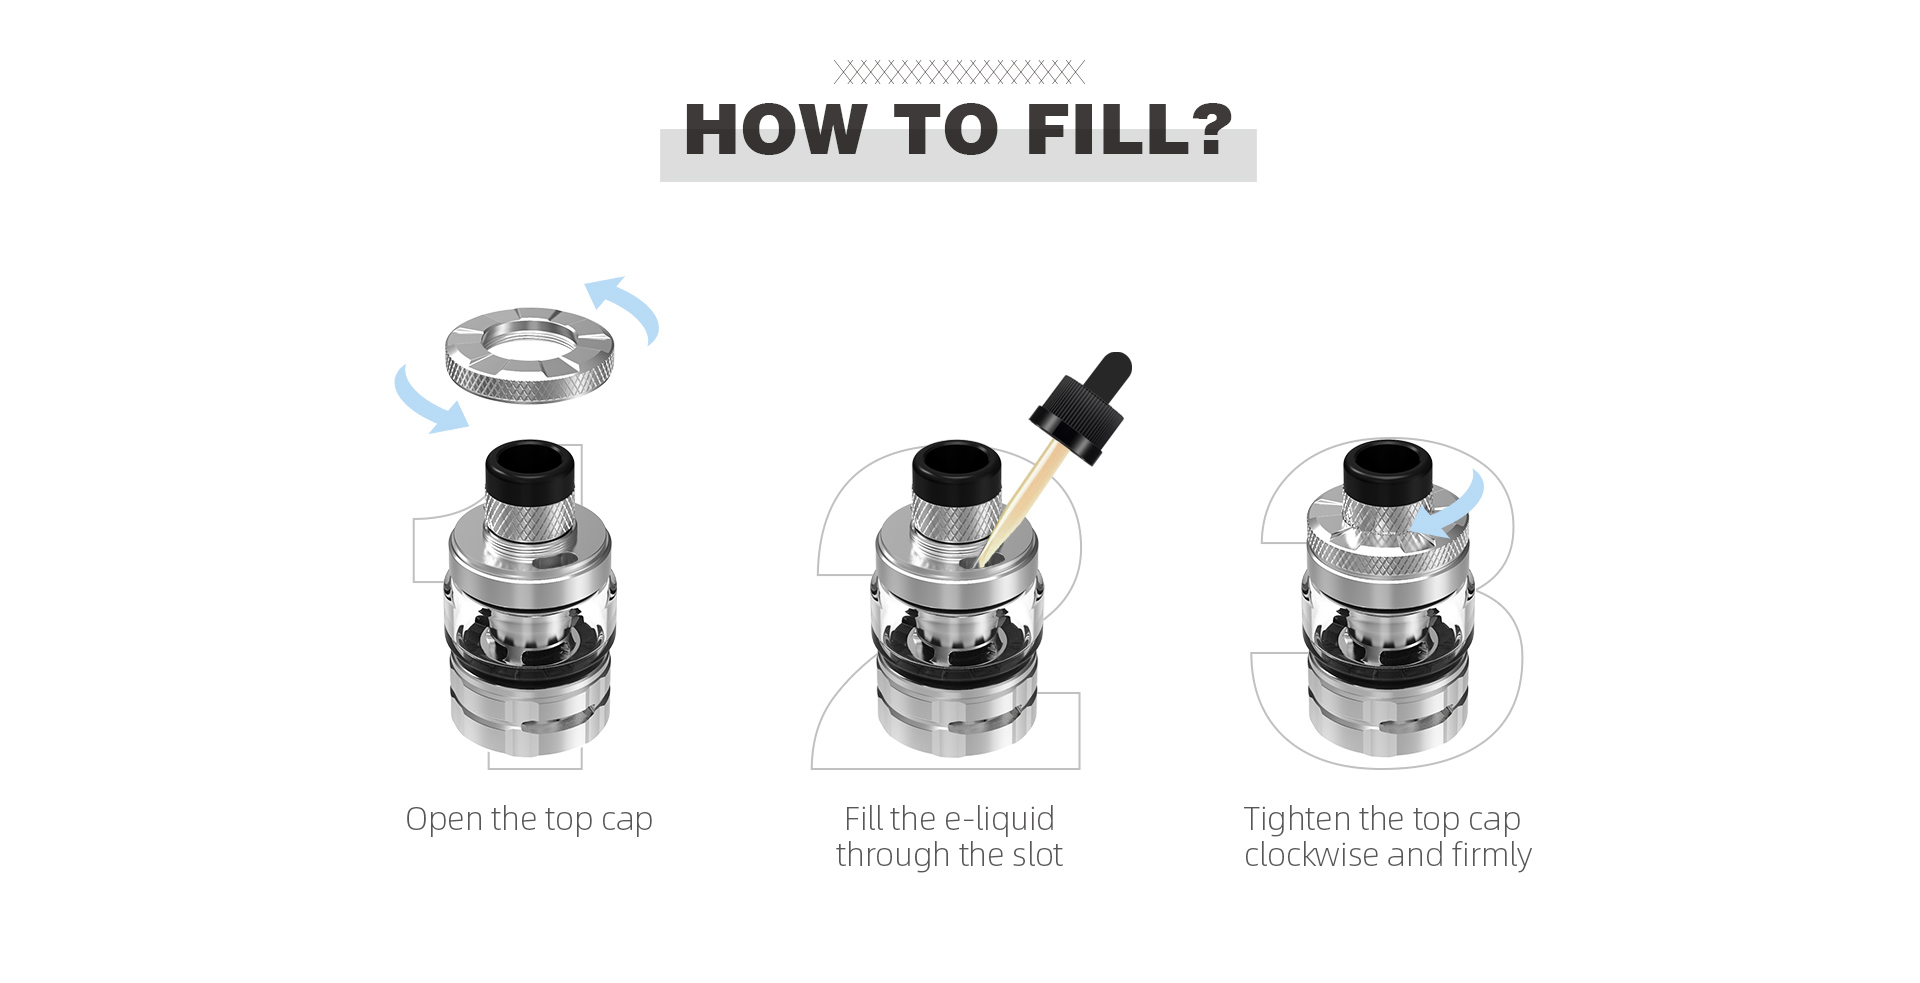 wirice launcher tank - eliquid refill system